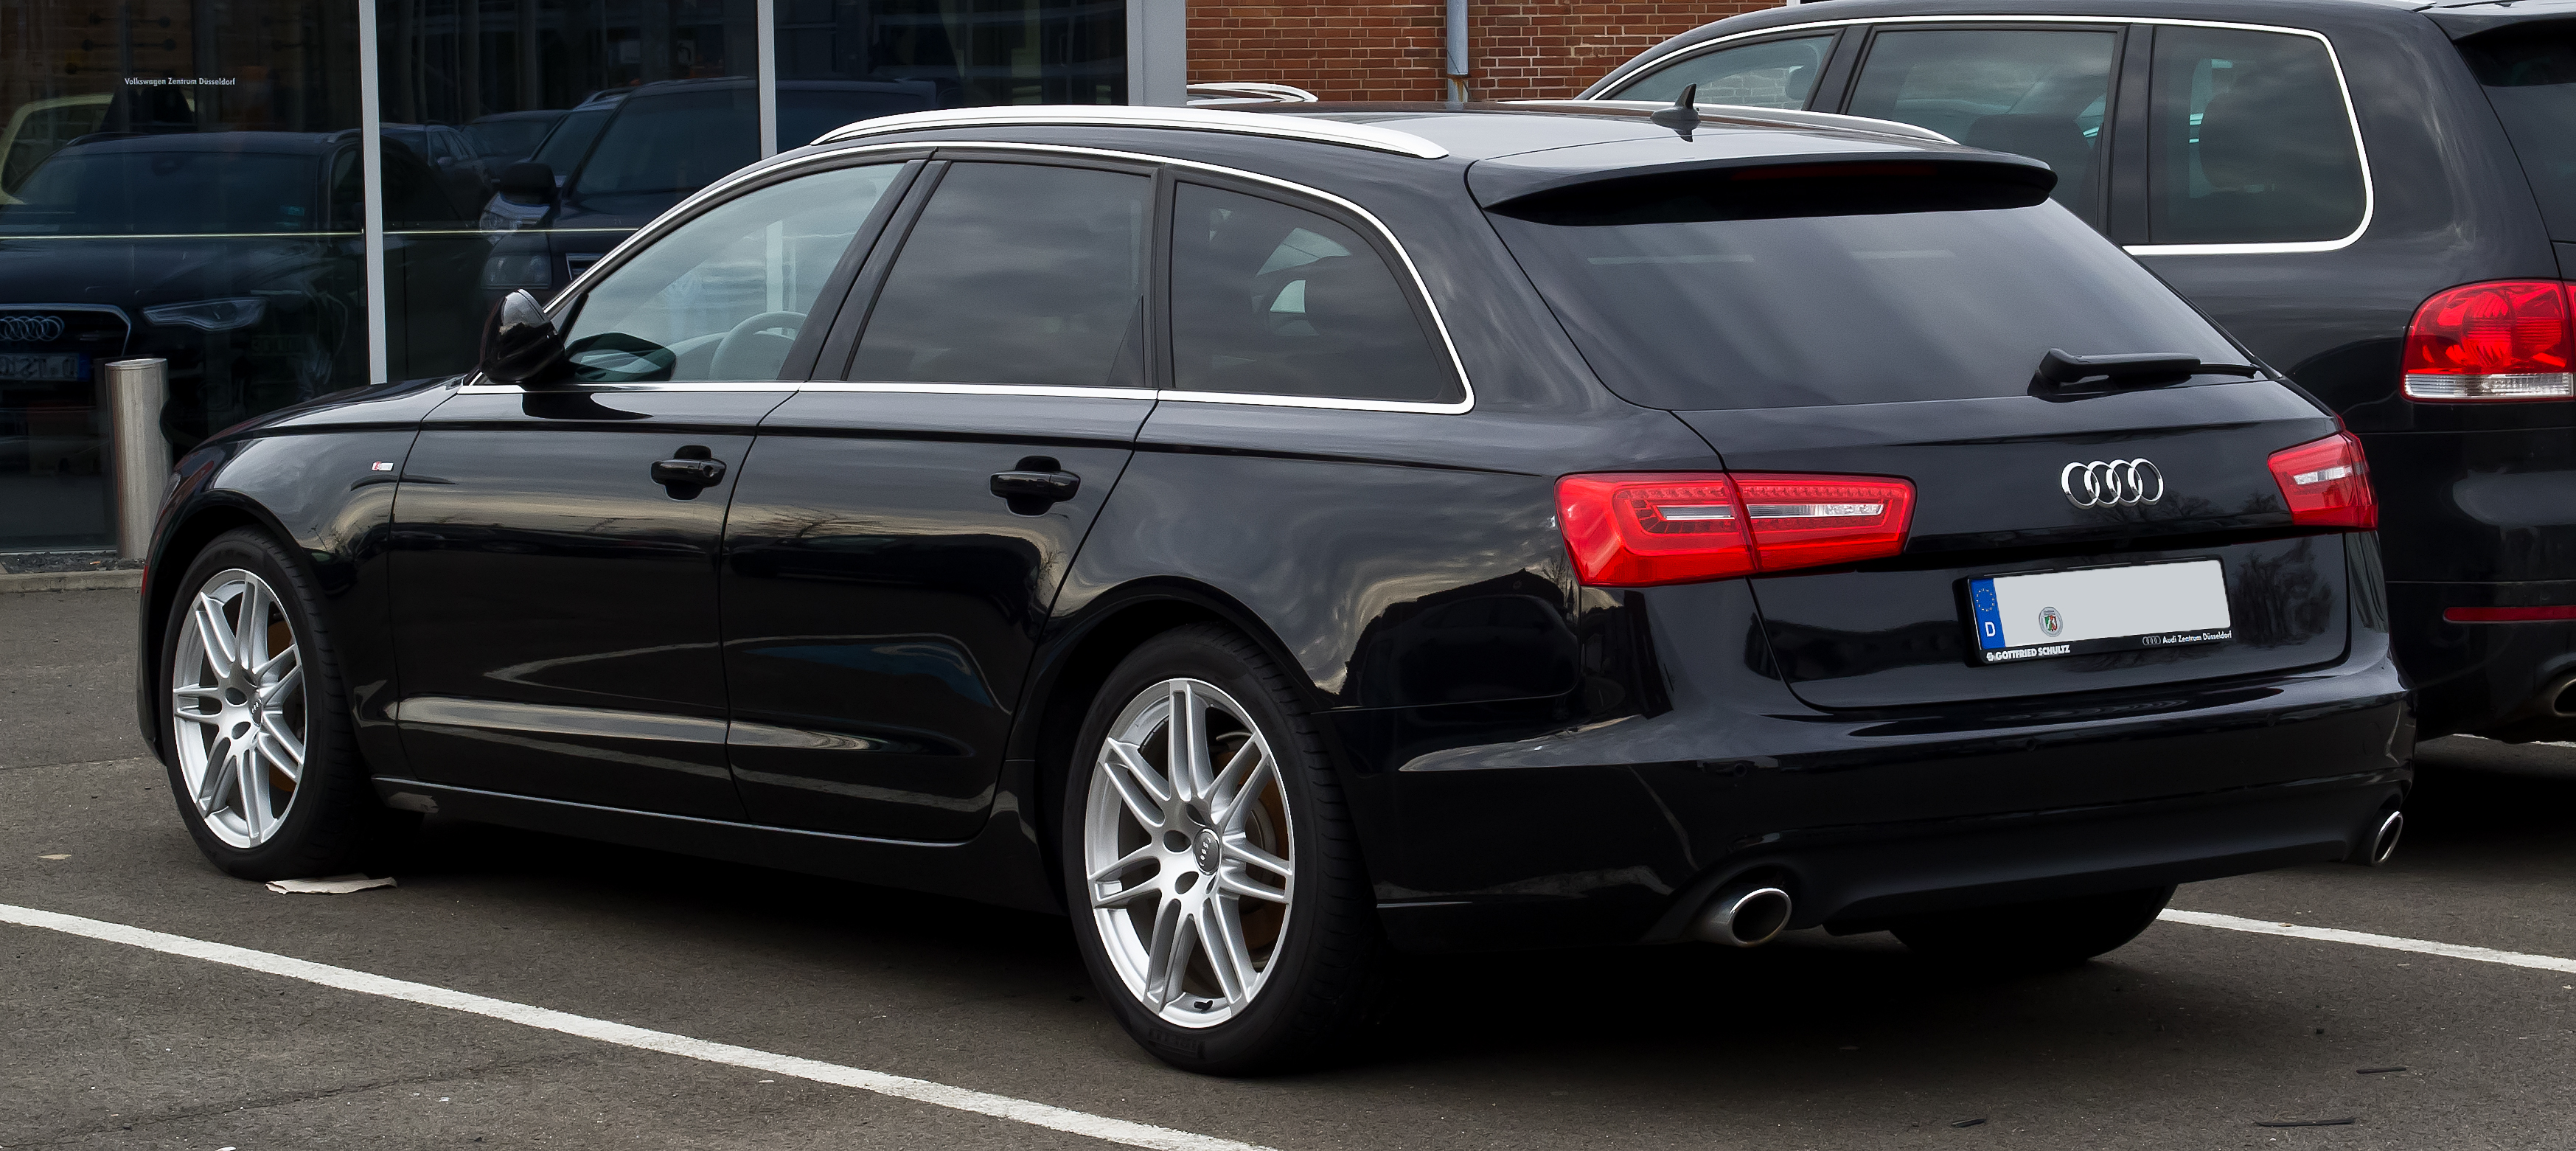 File Audi A6 Avant S Line C7 Heckansicht 11 Februar